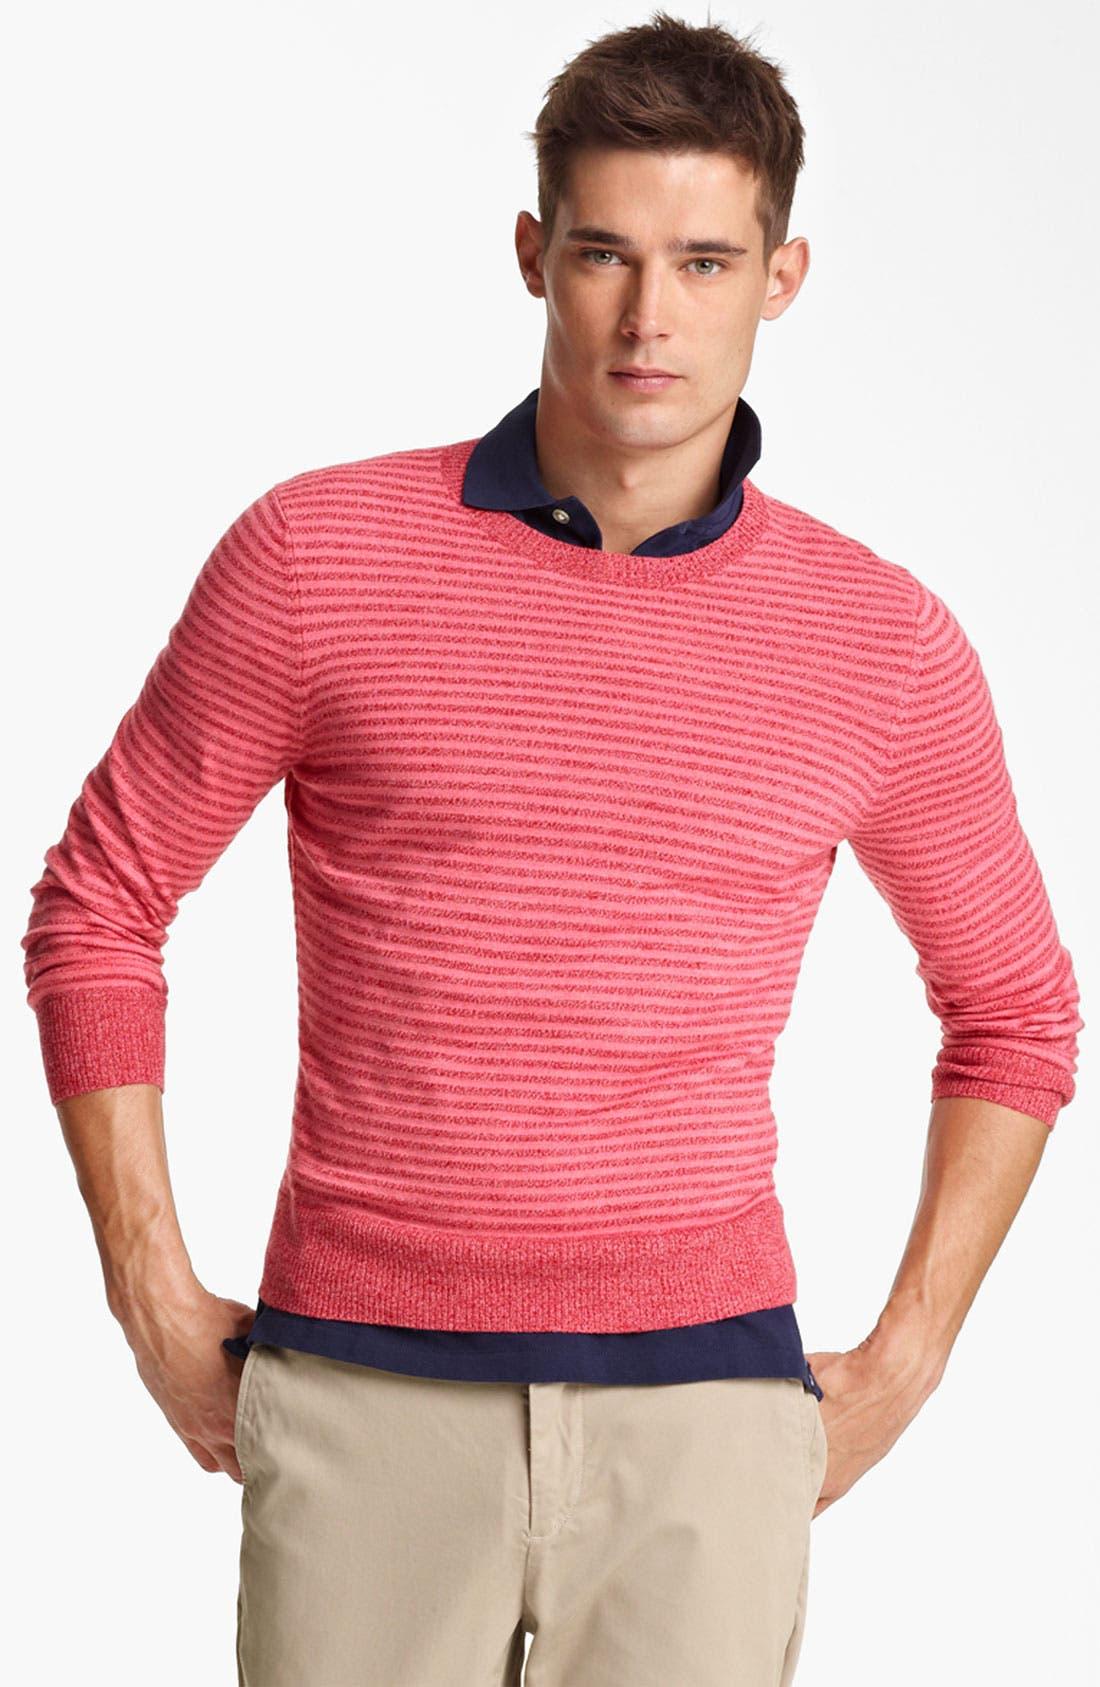 Main Image - Jack Spade 'Judson' Stripe Merino Wool Crewneck Sweater